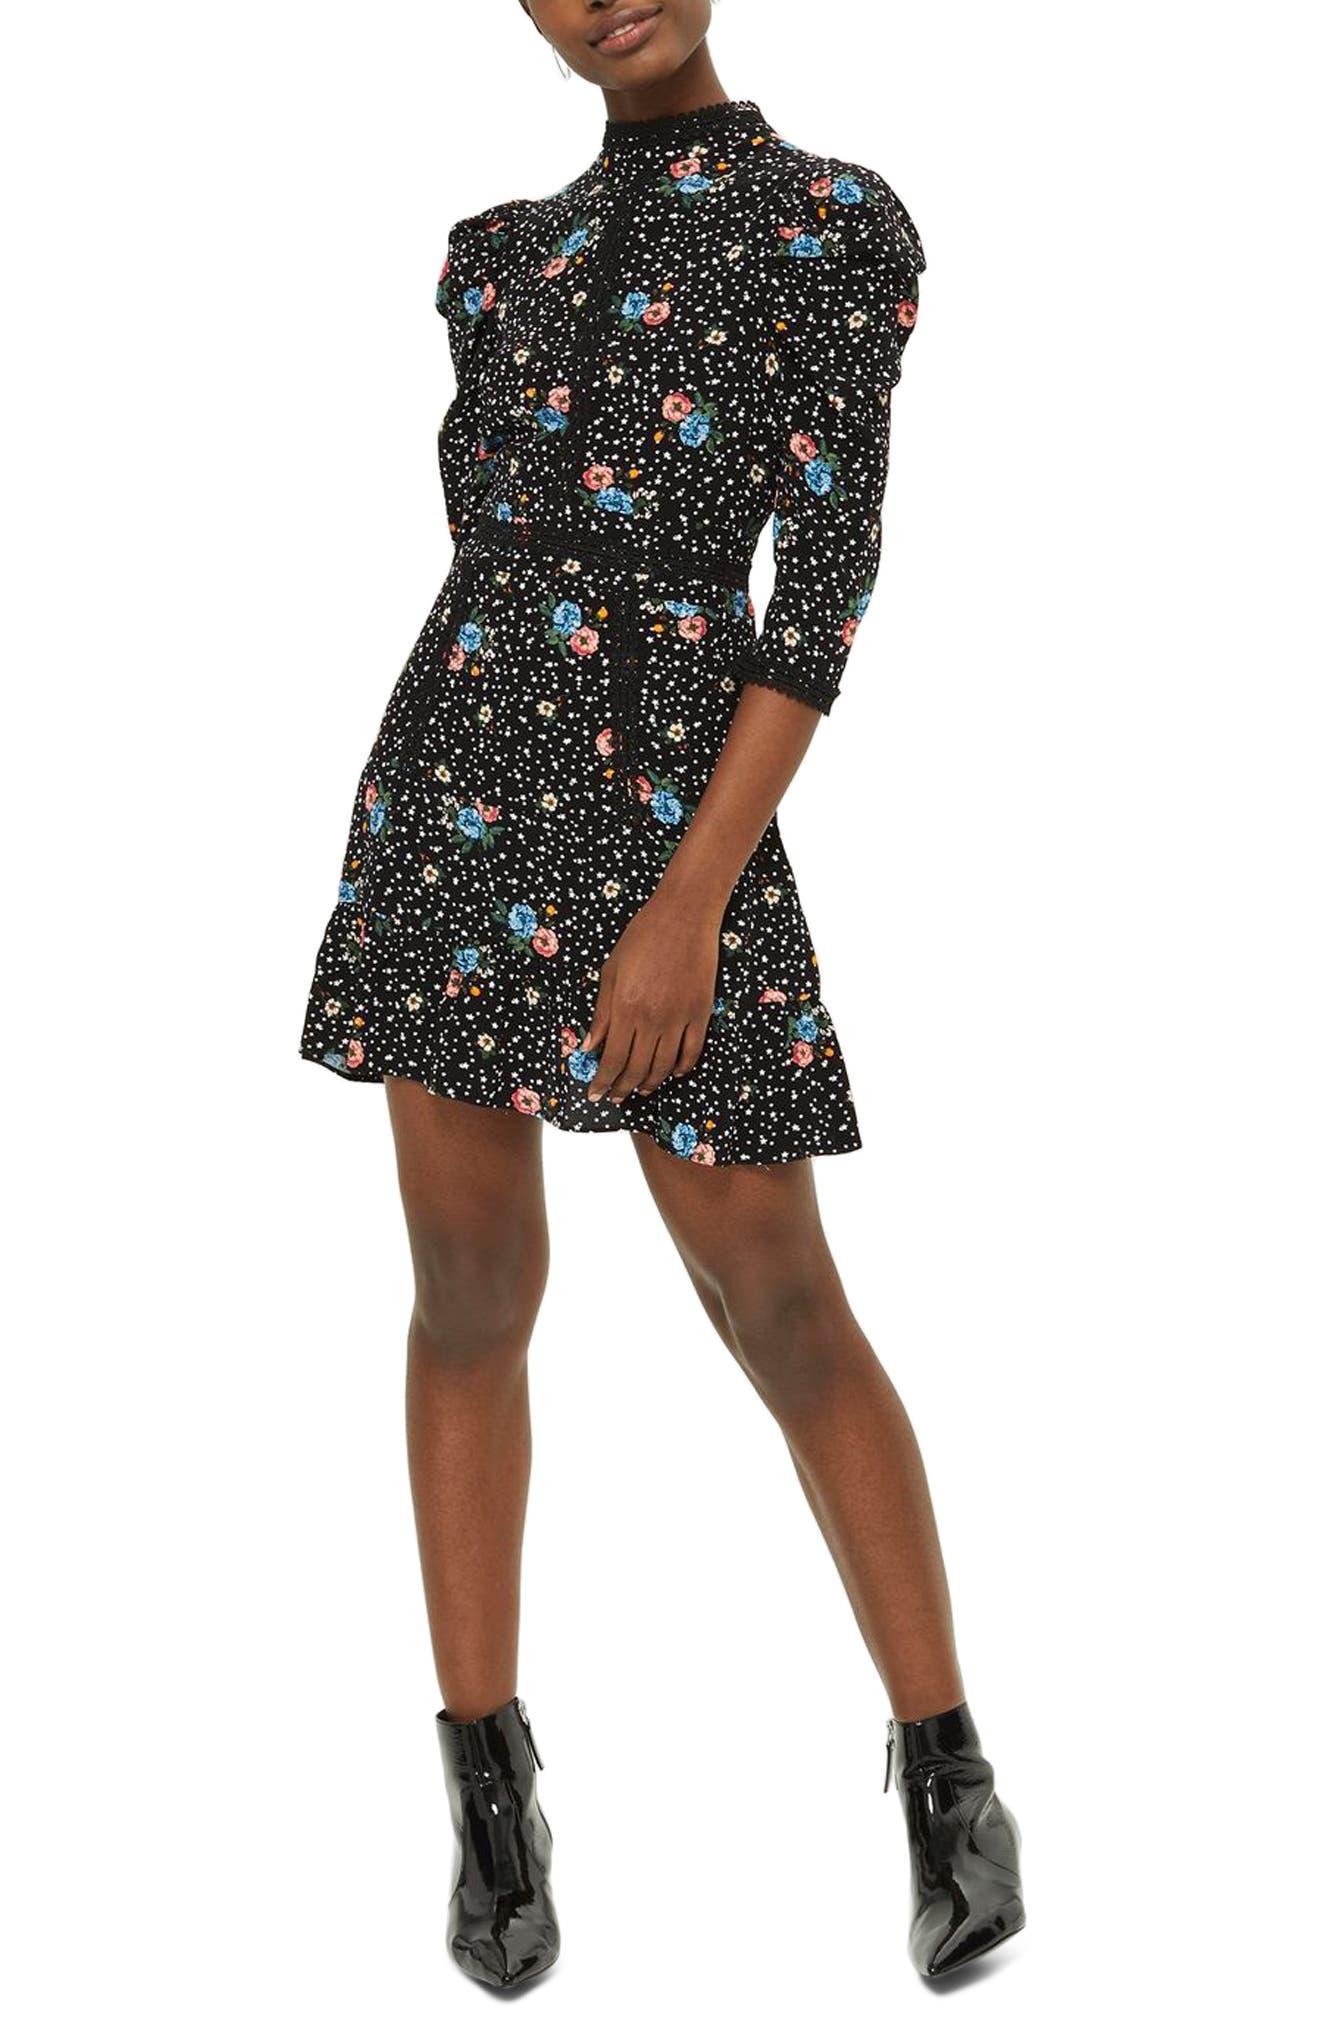 Topshop Lace-Up Back Floral Dress